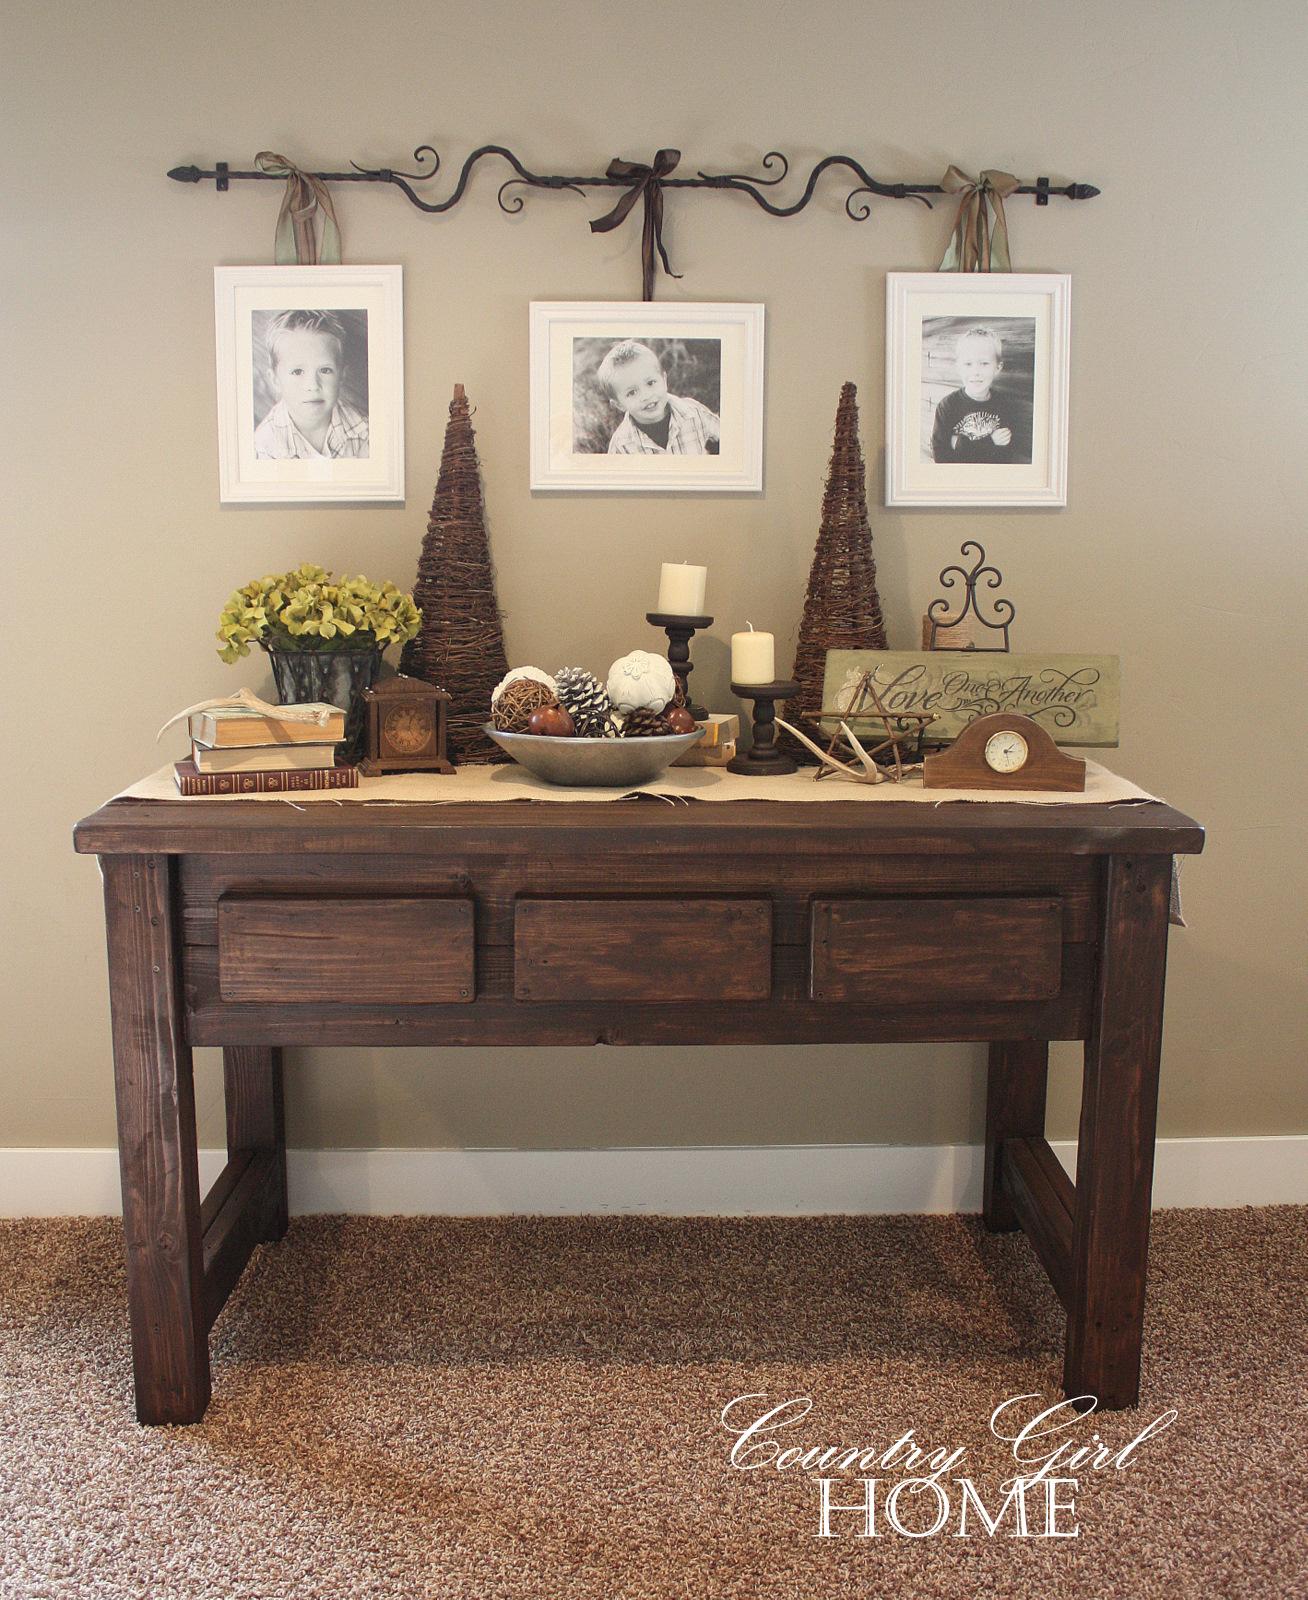 Sofa Table Decorating Ideas | DECORATING IDEAS